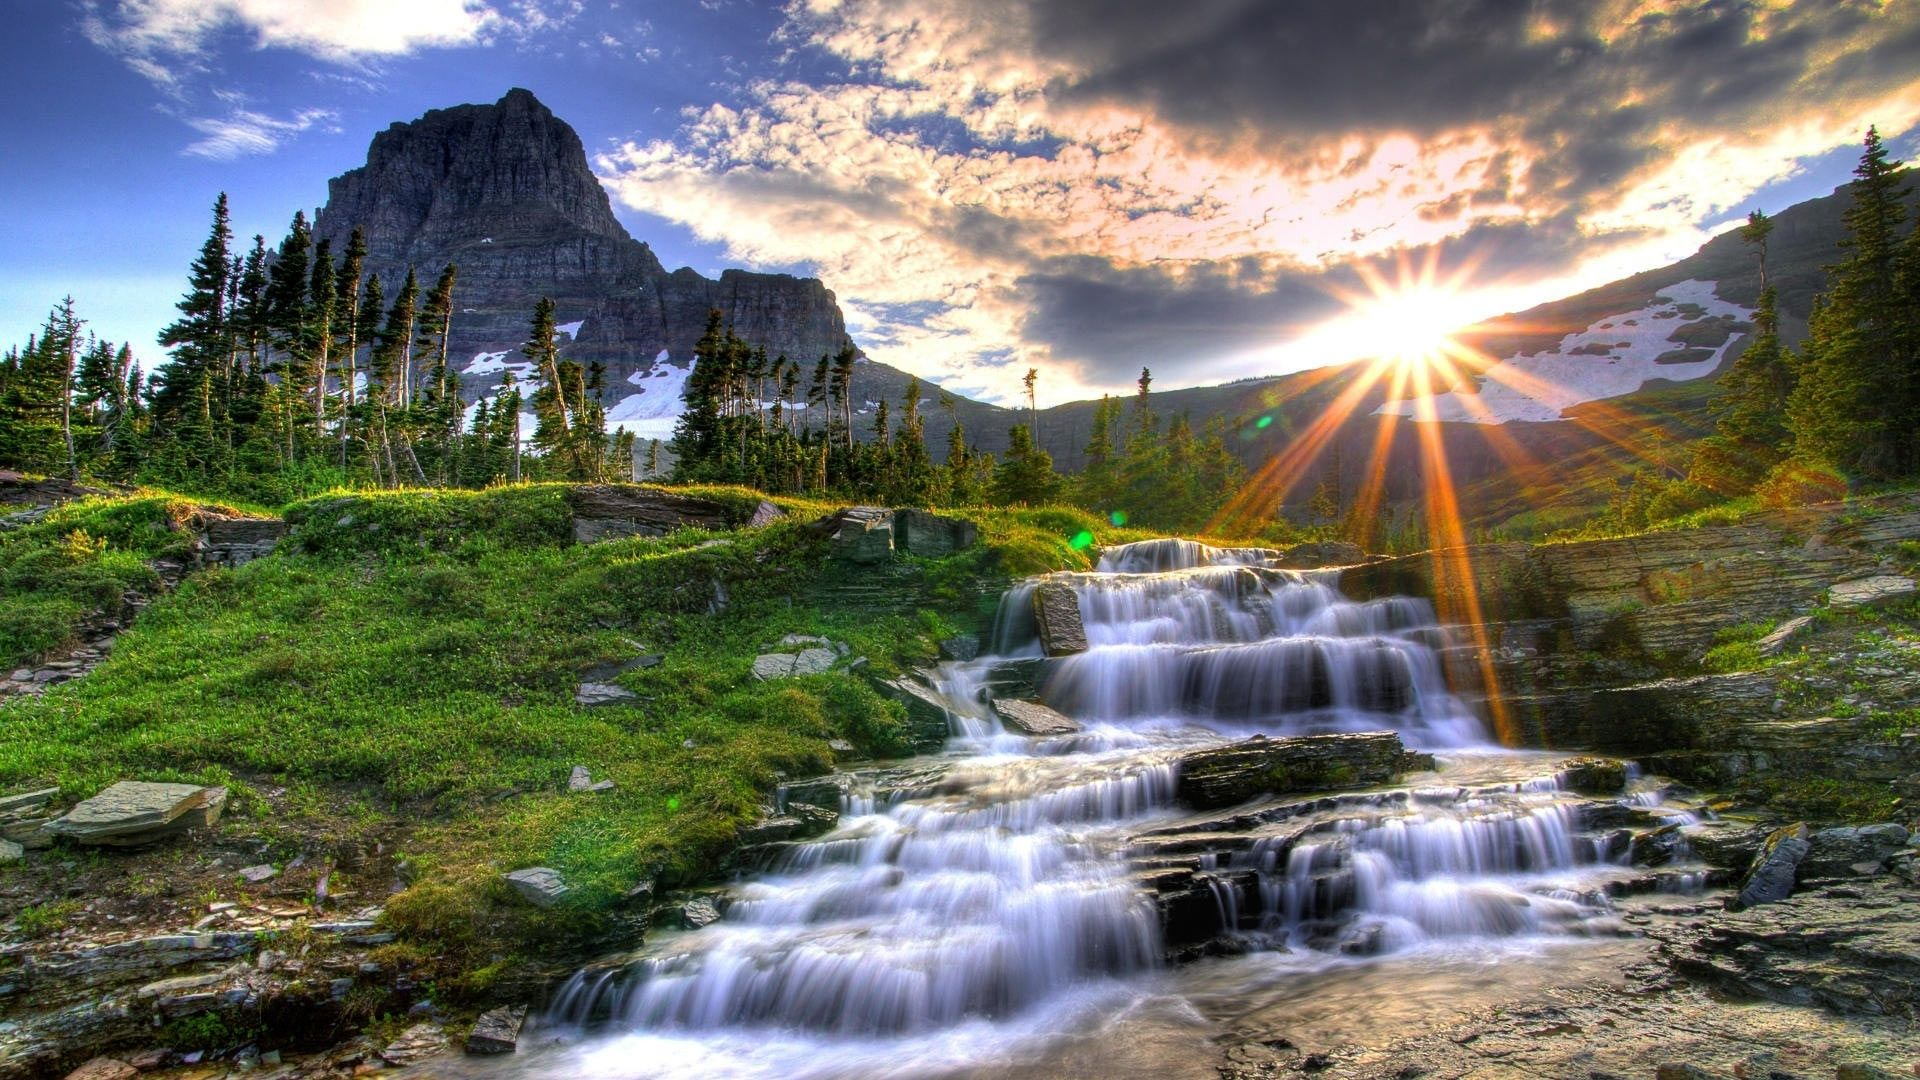 10 New Free Desktop Wallpaper 1920x1080 Full Hd 1080p For Pc Background Nature Desktop Wallpaper Nature Desktop Hd Landscape